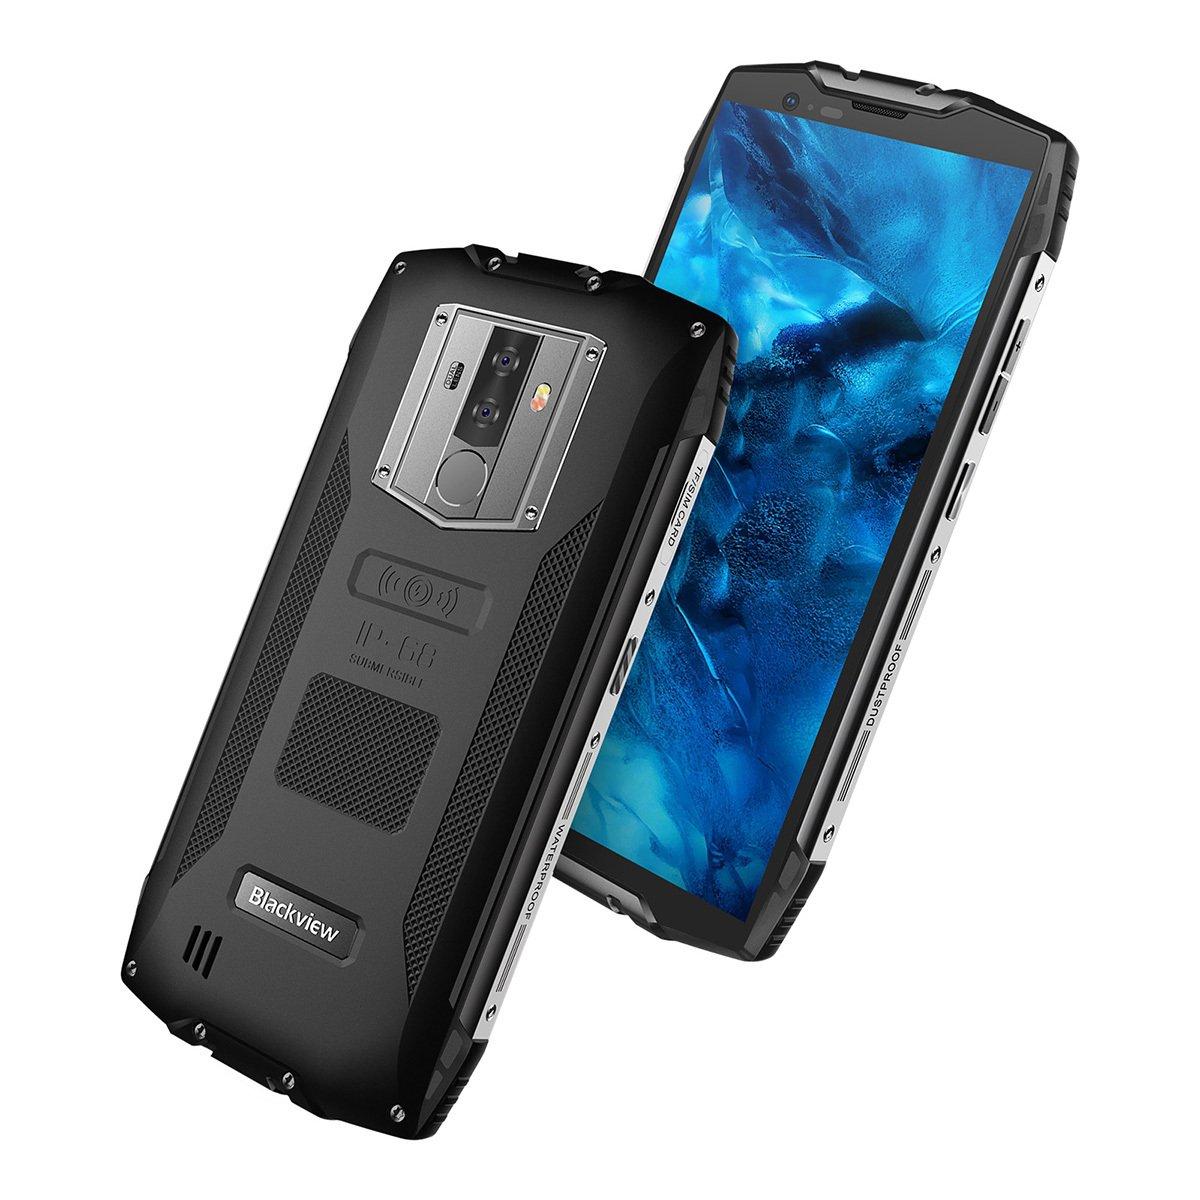 Смартфон Blackview BV6800 Pro 4/64Gb DS Black фото 6